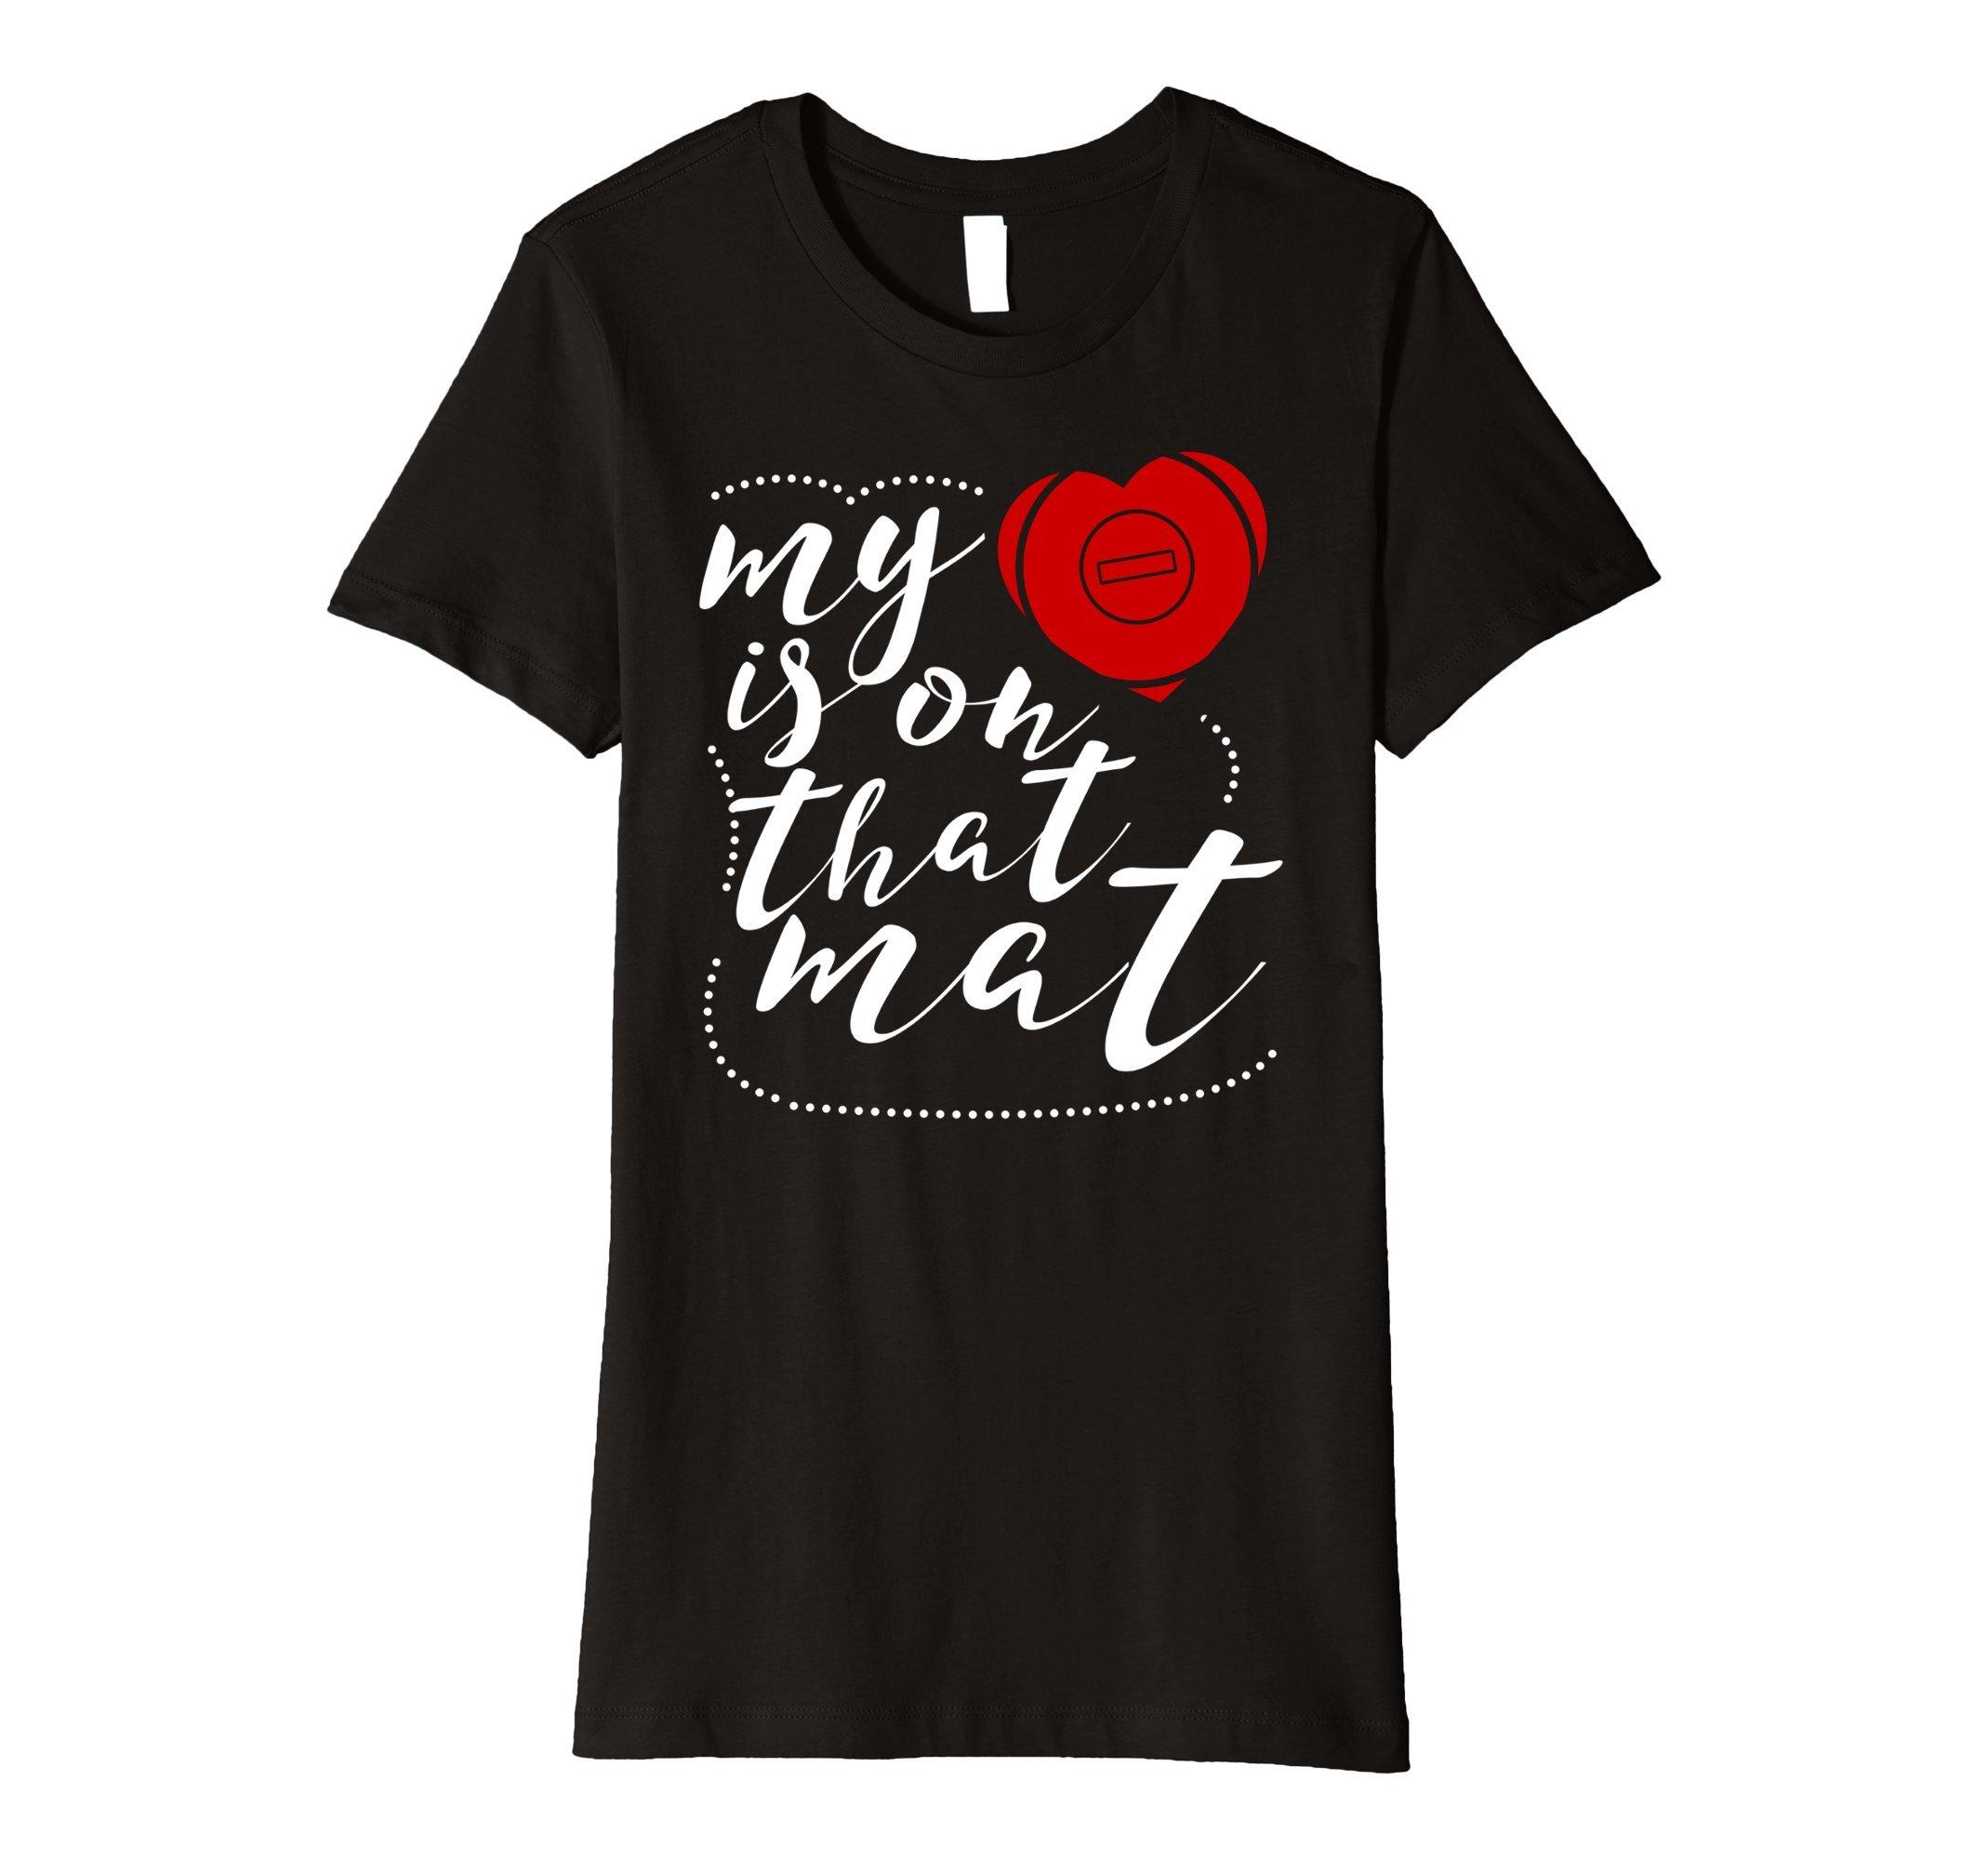 Womens Best Wrestling Shirt For Kids Funny Team T-Shirts Mens Women XL Black